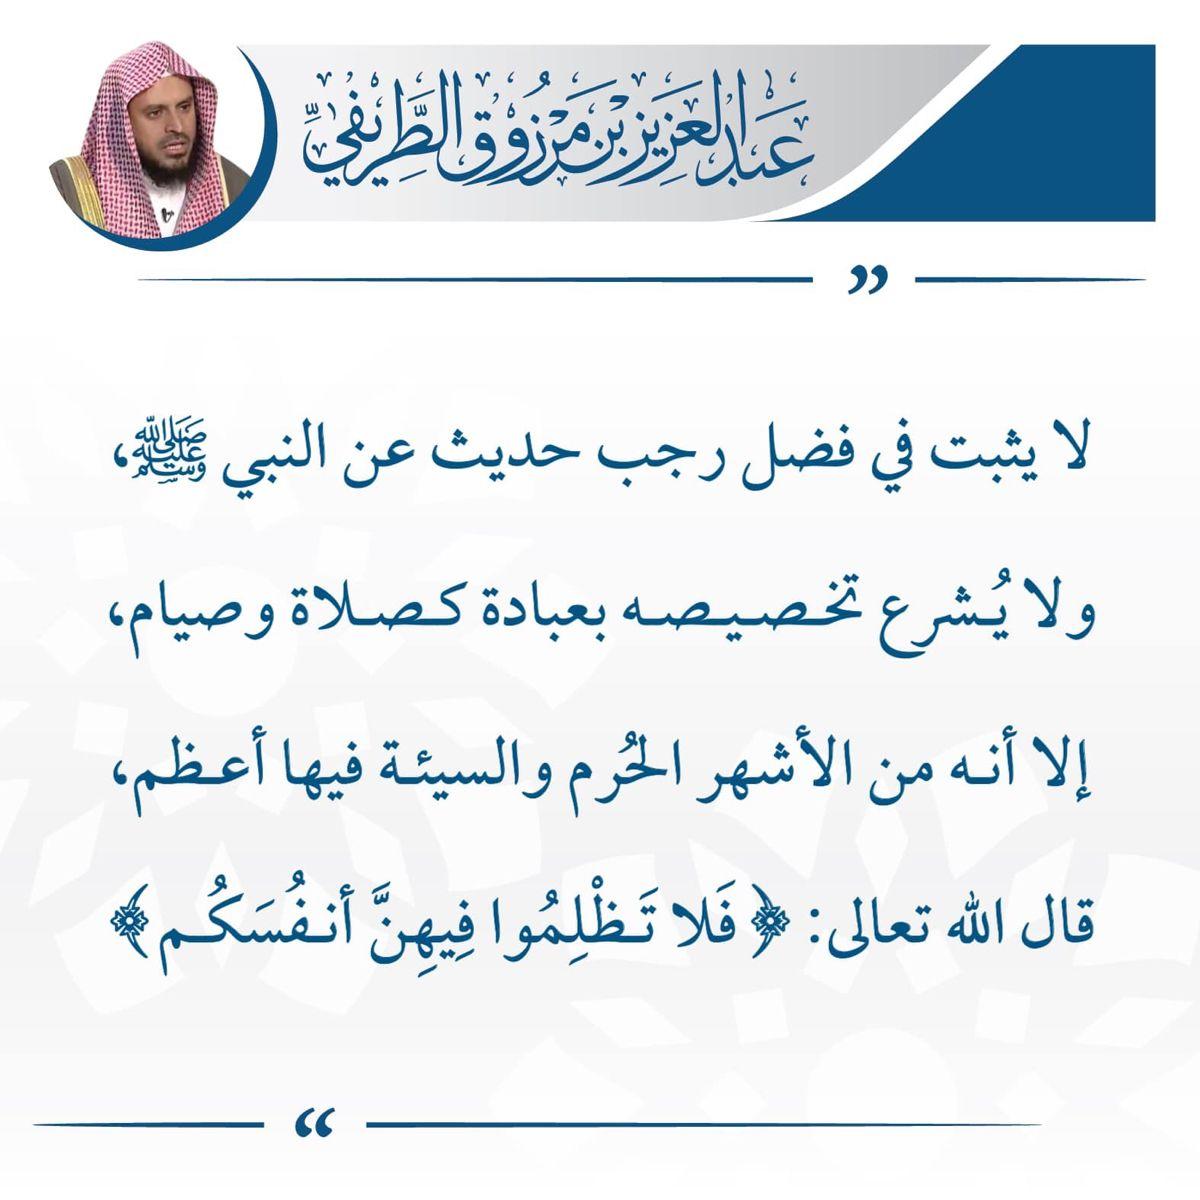 Pin By م شكاهـ On تغريدات الشيخ عبد العزيز الطريفي Calligraphy Arabic Calligraphy Islam